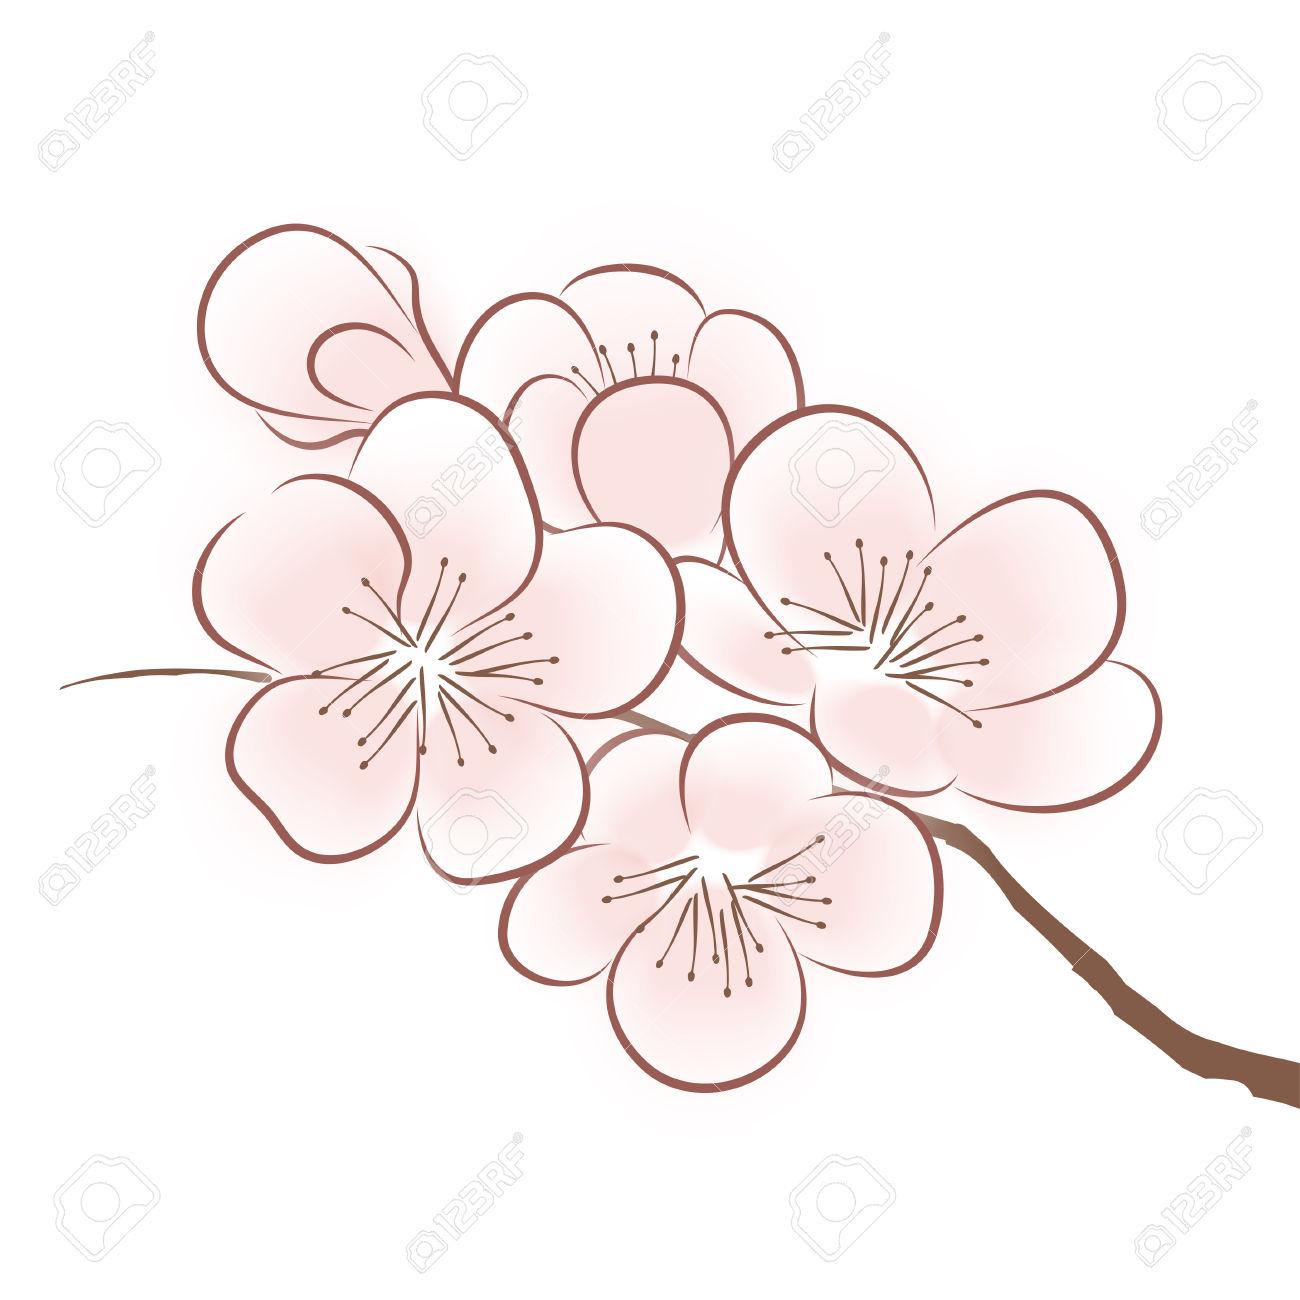 1300x1300 Drawing Flower Cherry Blossom Drawn Sakura Blossom Sakura Flower